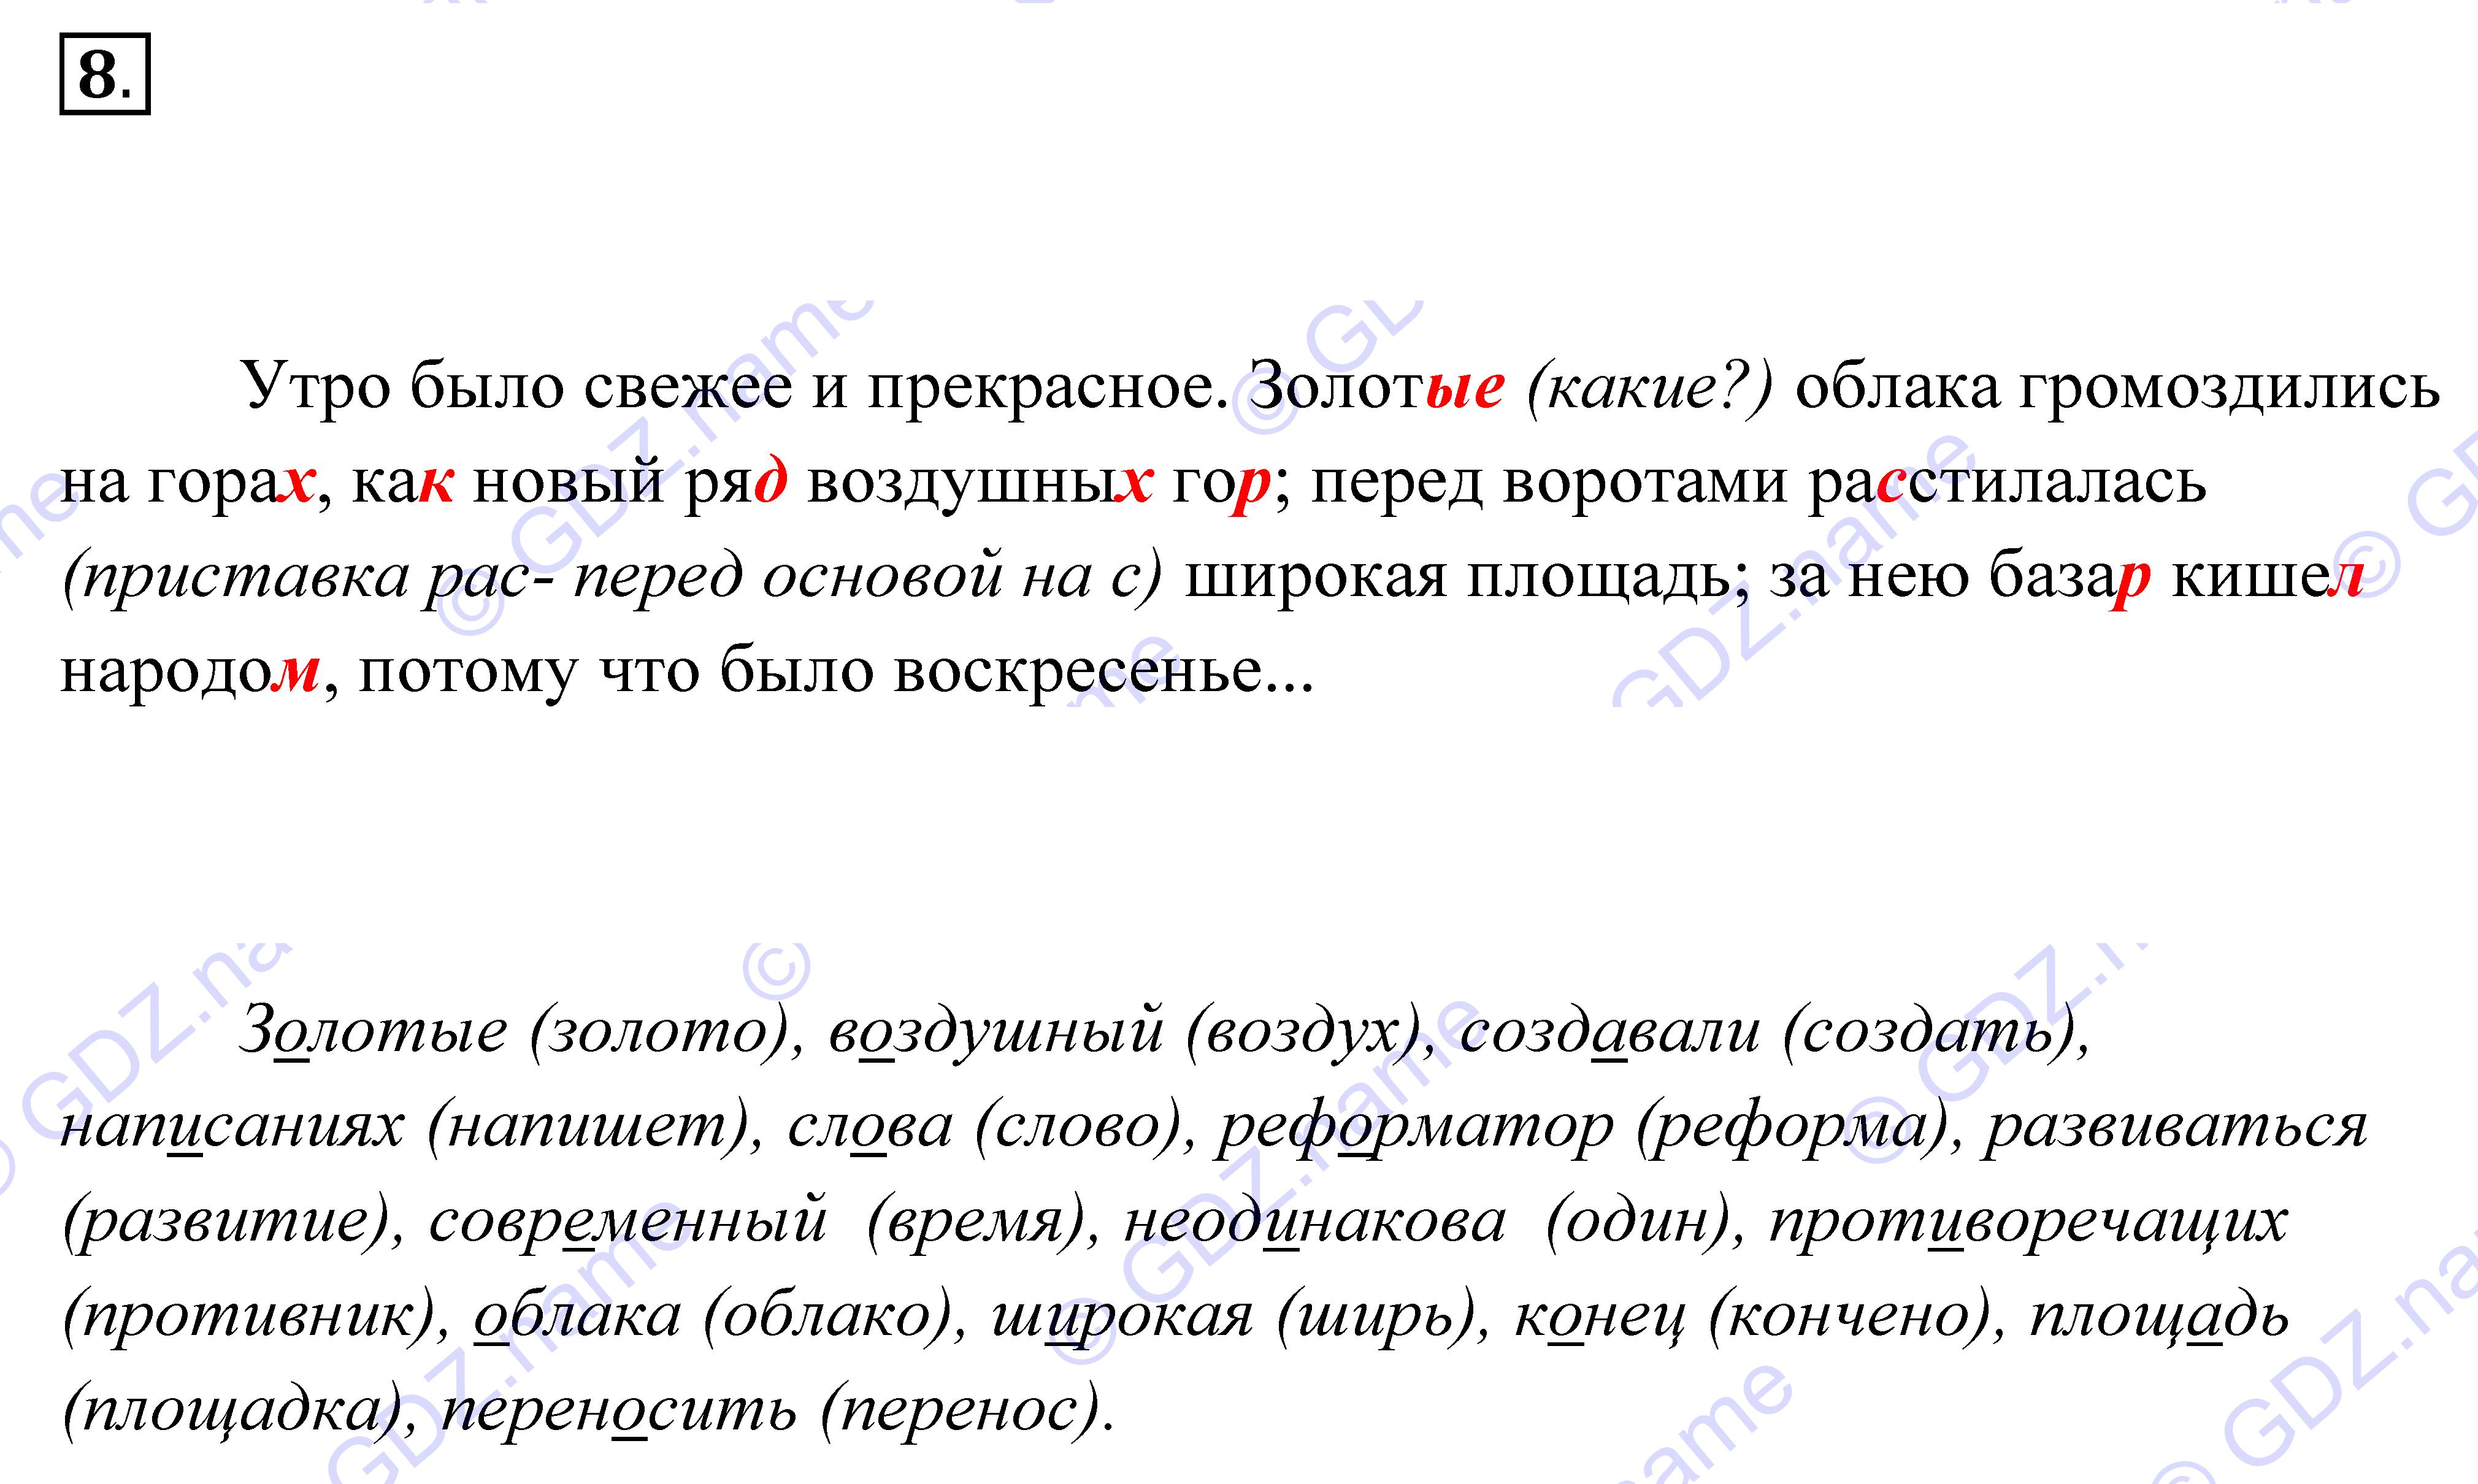 Гдз по русскому языку 7 класс пименова 2018 дрофа онлайн